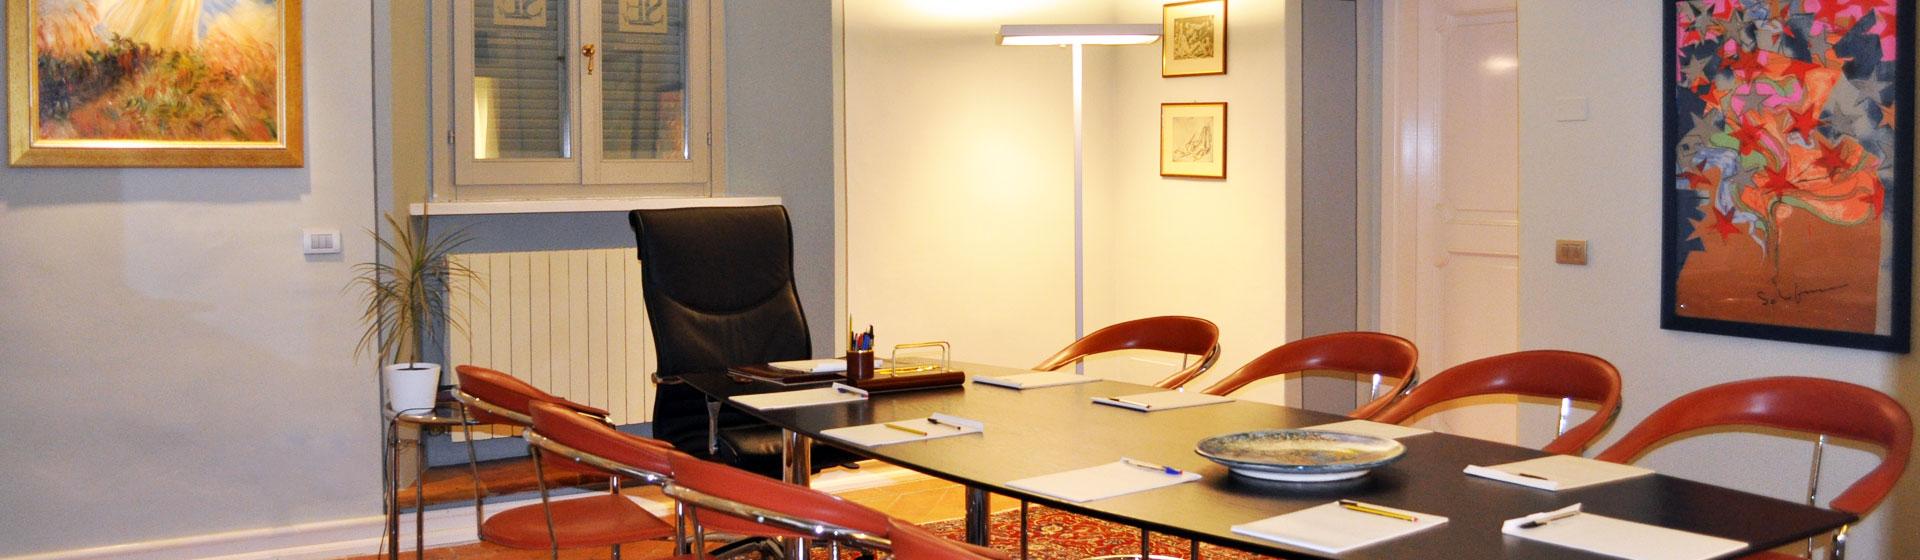 office-fo-wide2